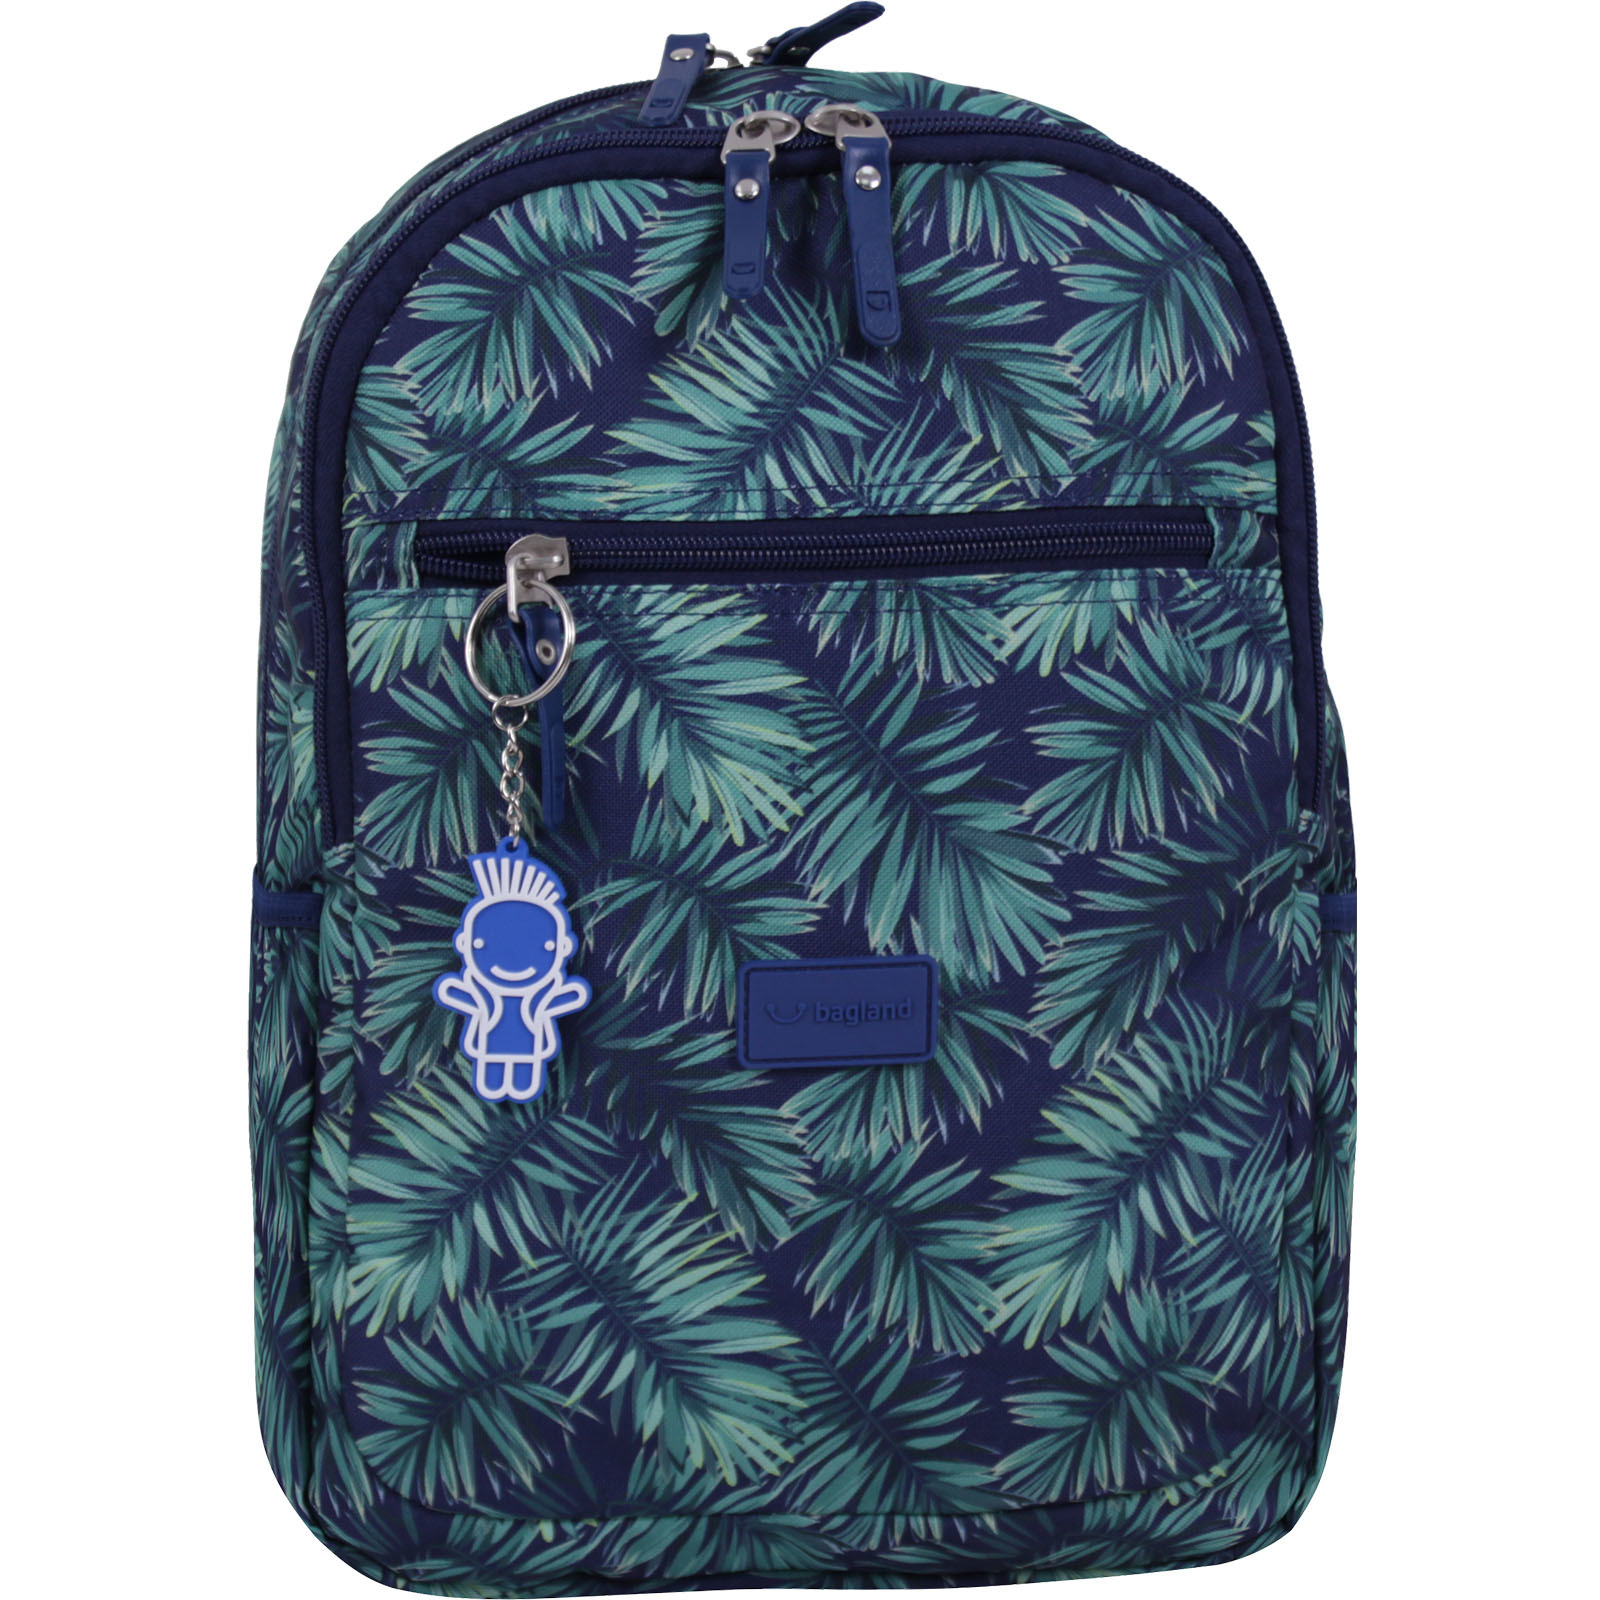 Детские рюкзаки Рюкзак Bagland Young 13 л. сублімація 456 (00510664) IMG_7948-1600-456.jpg